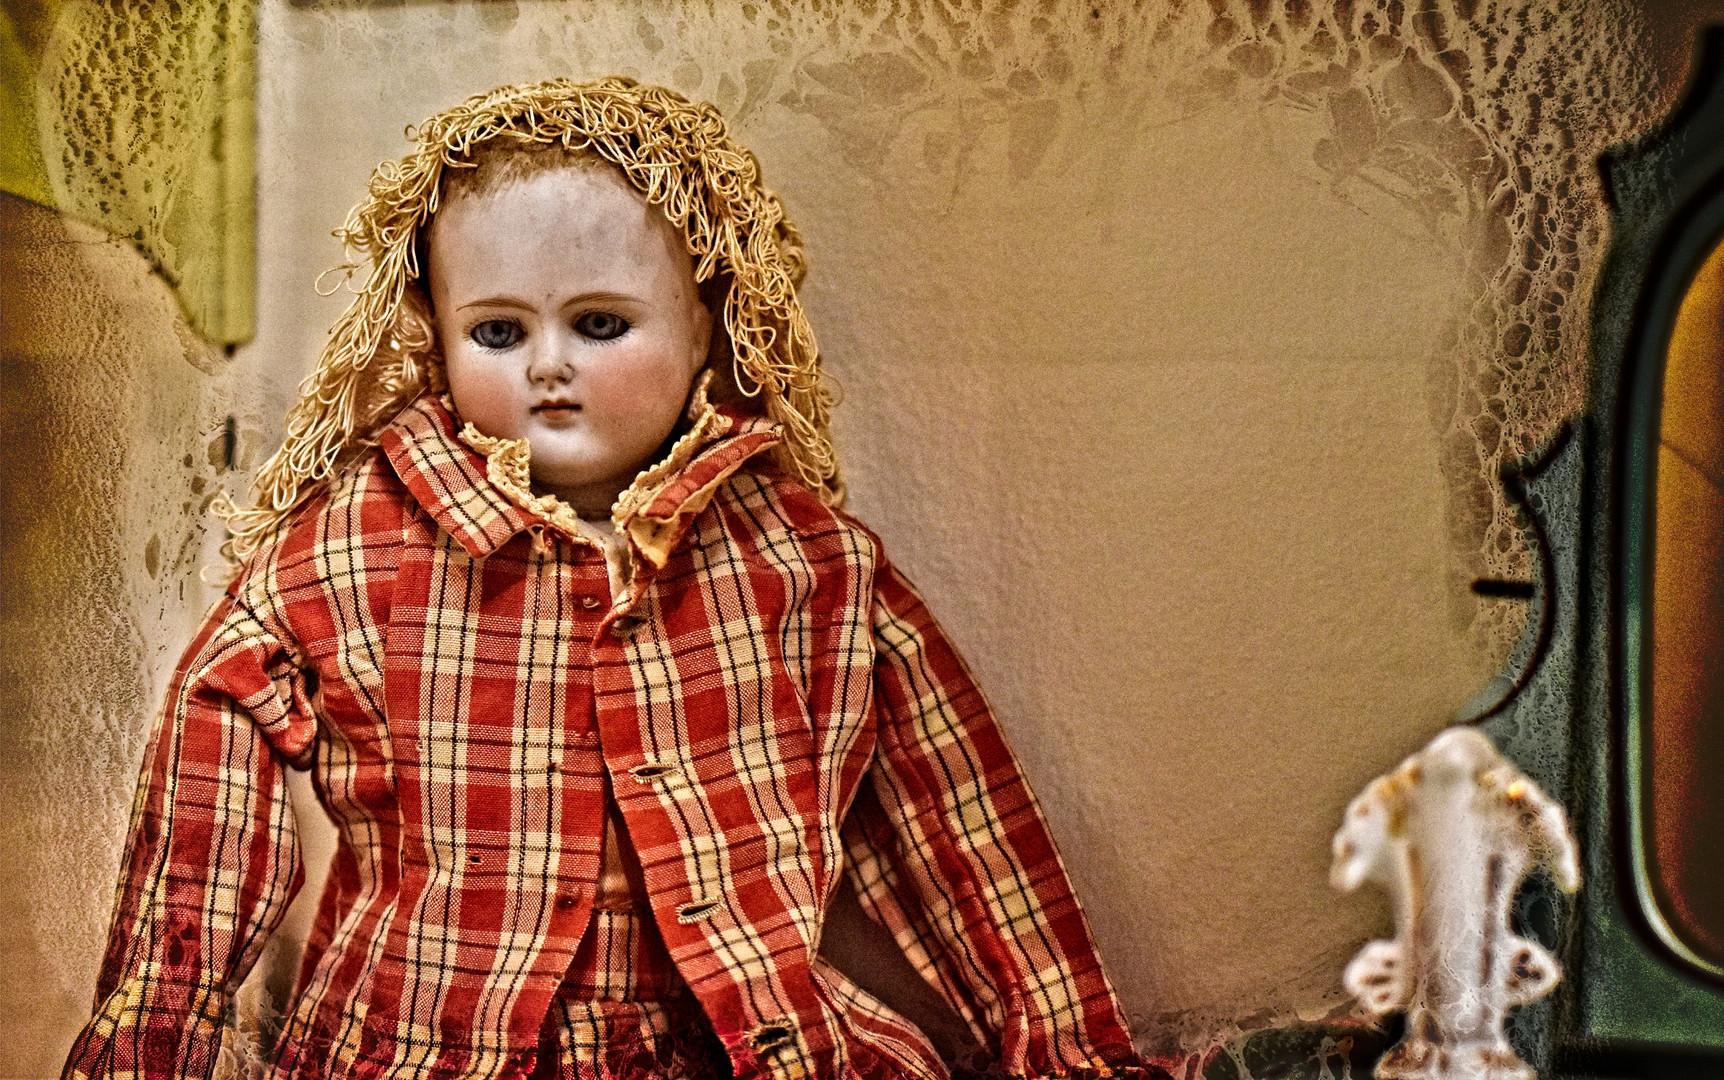 Doll in Orange Plaid Jacket